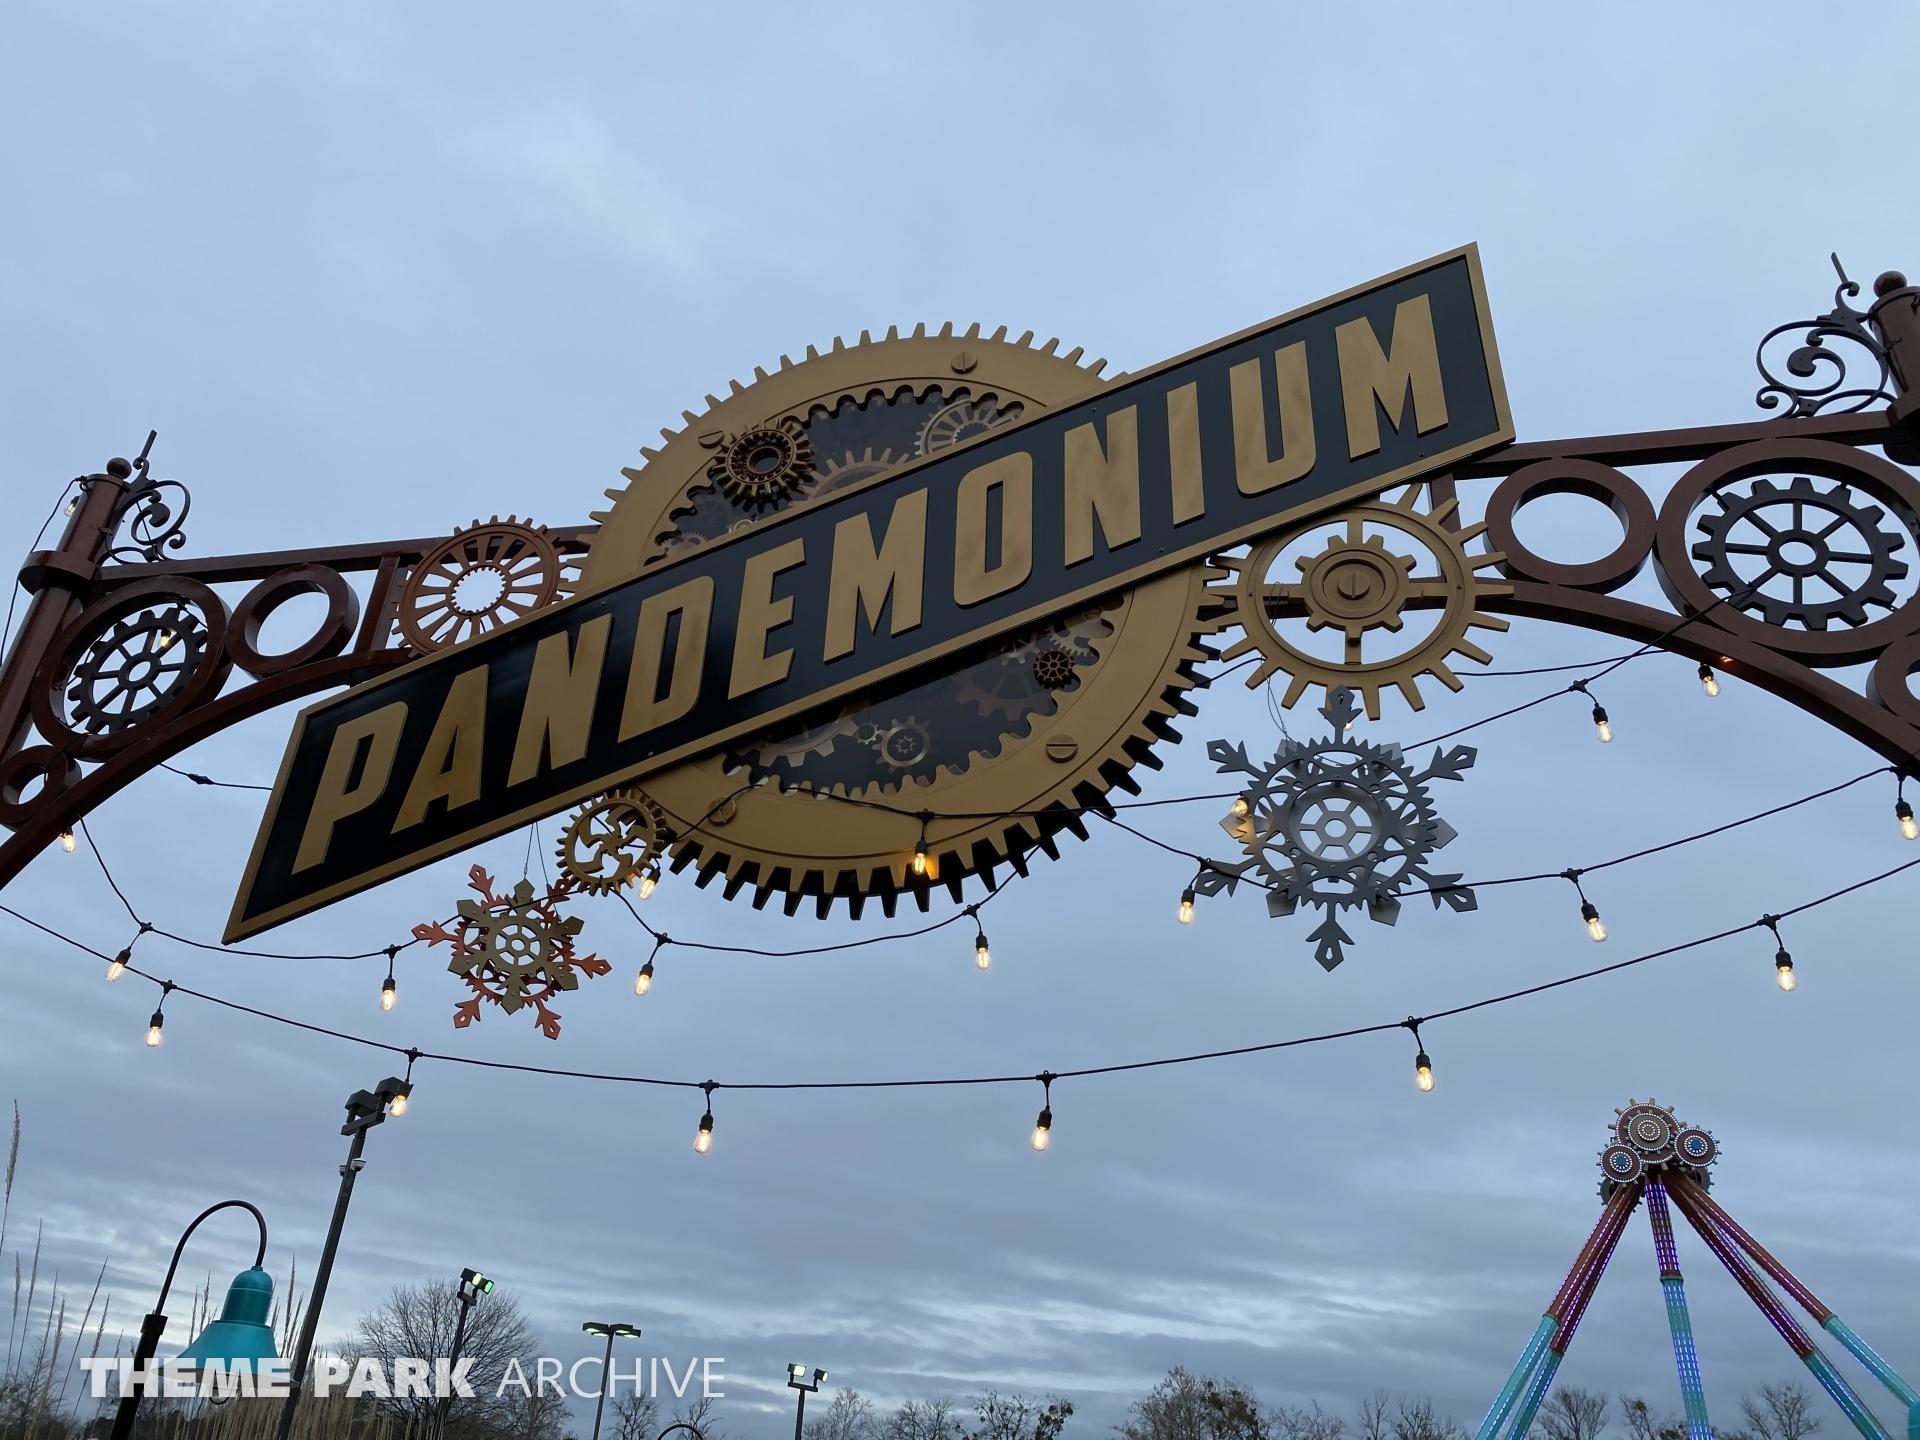 We ride Pandemonium